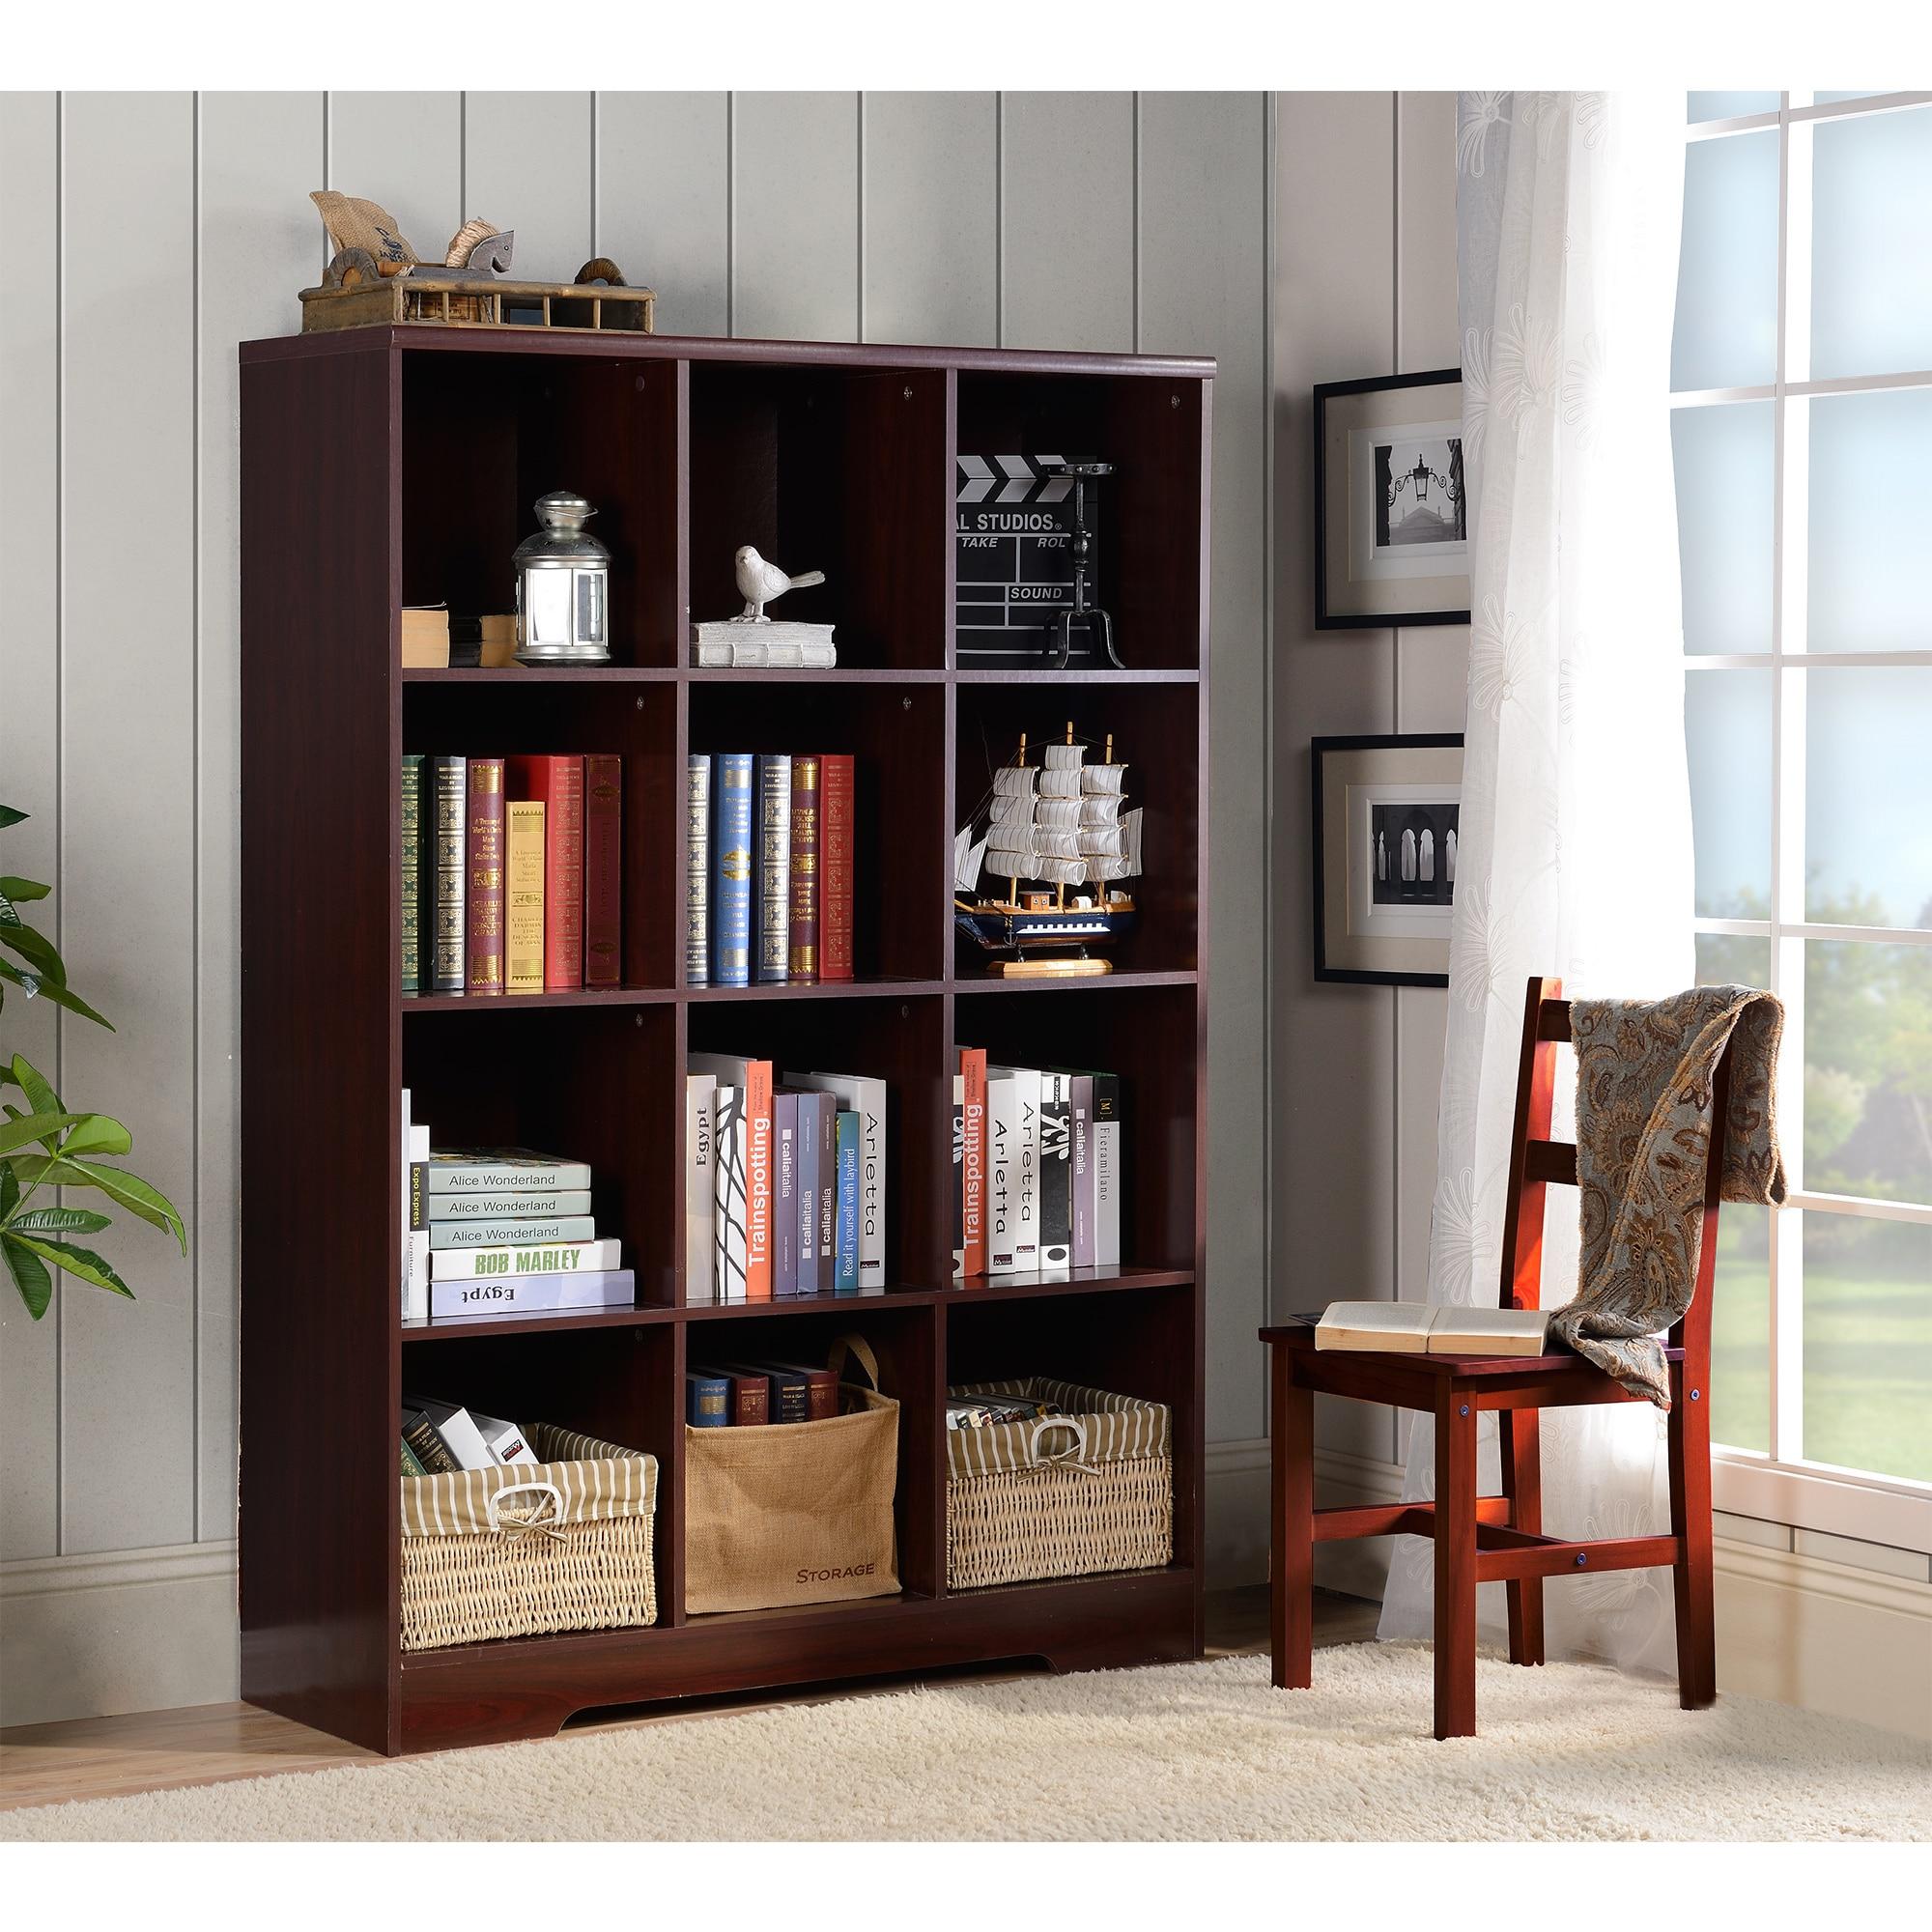 s classics shop hayneedle classic cu com cabinet gun furniture getimage brown american url ft wood